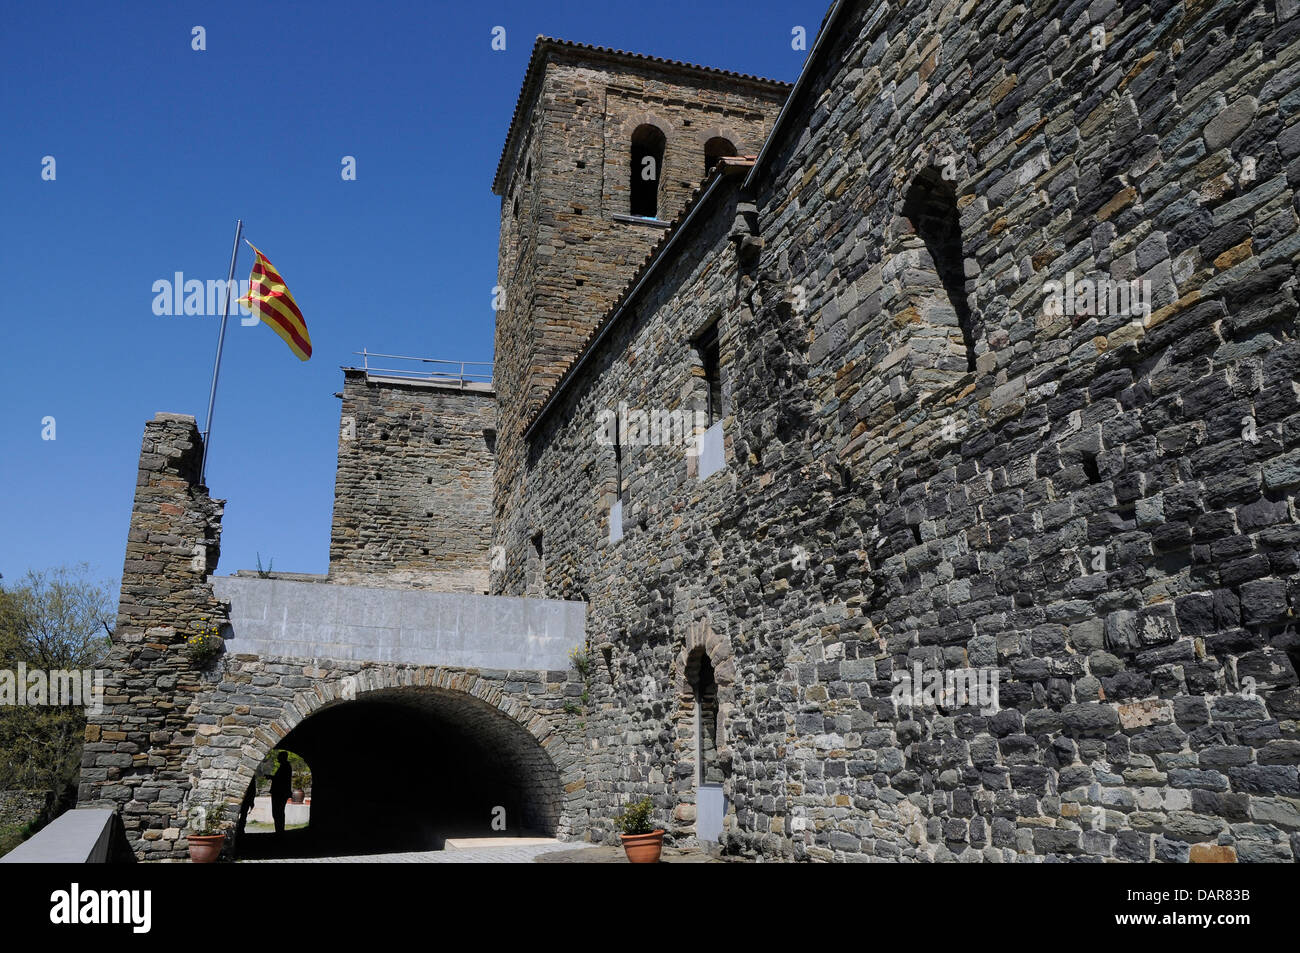 Catalan Romanesque architecture, Sant Pere de Casserres is a Benedictine monastery - Stock Image